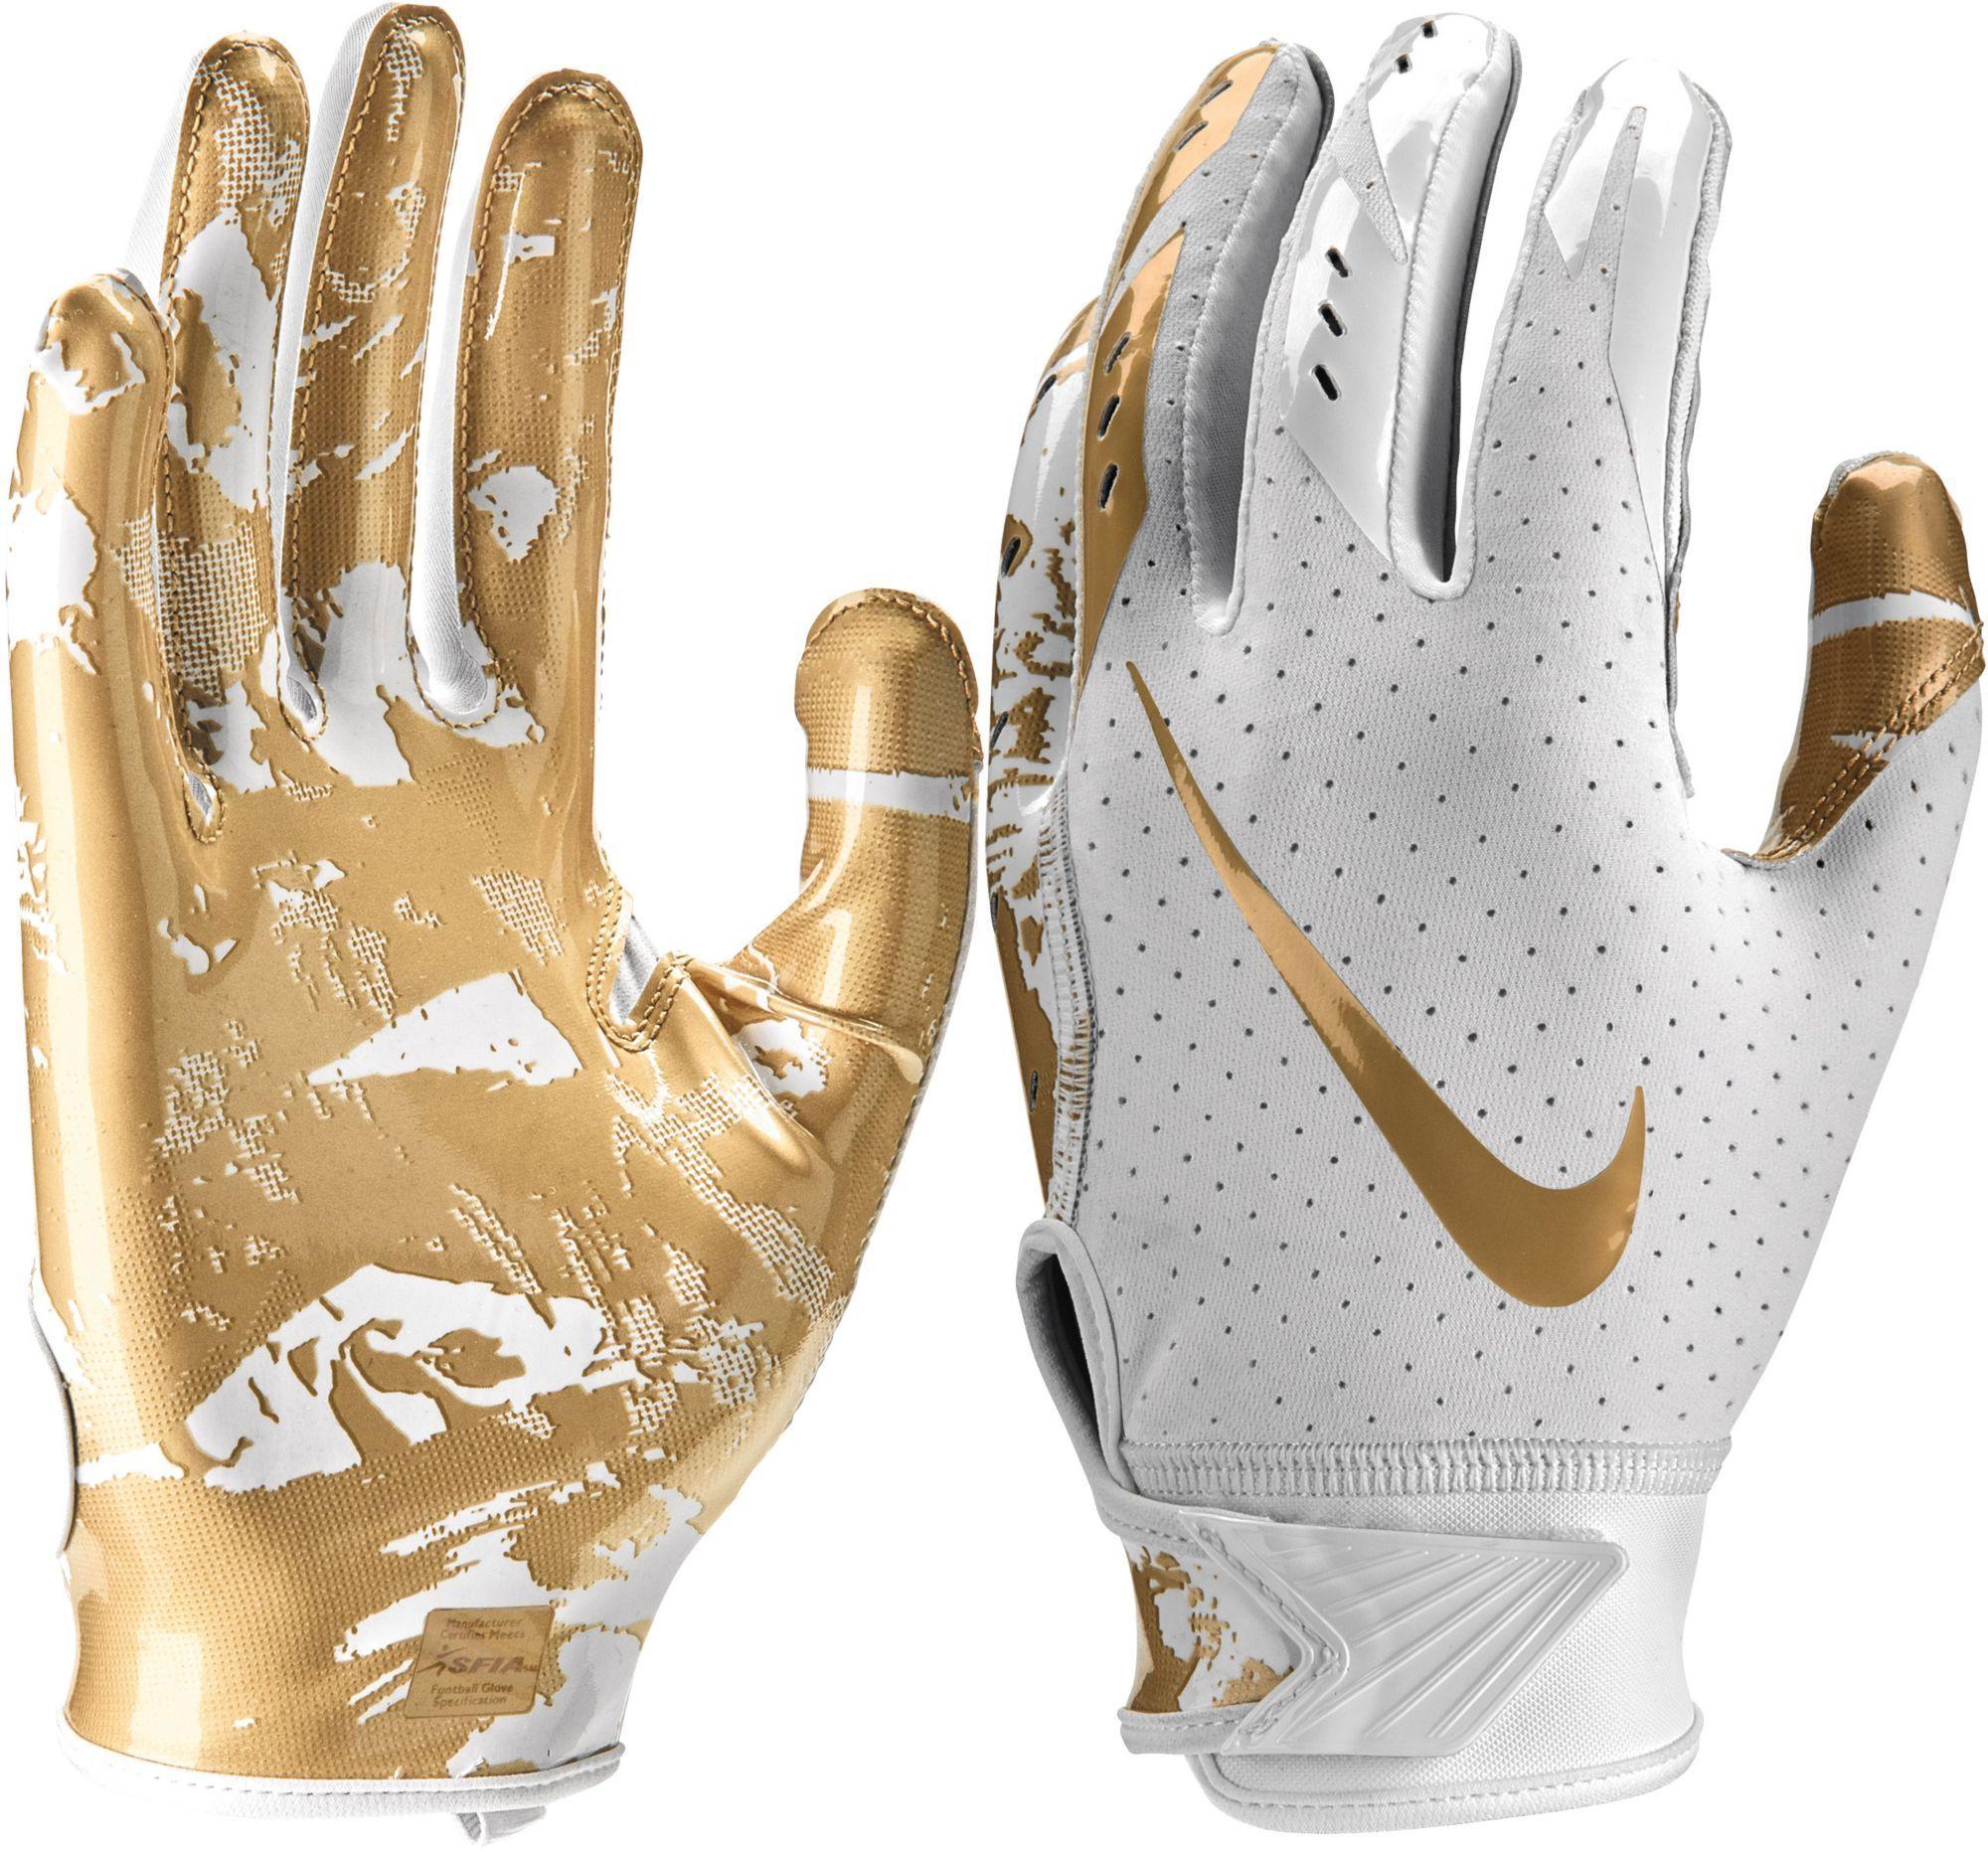 Nike Youth Vapor Jet 5 0 Receiver Gloves 2018 White Metallic Gold Vaporizers Gloves Nike Vapor Football Gear